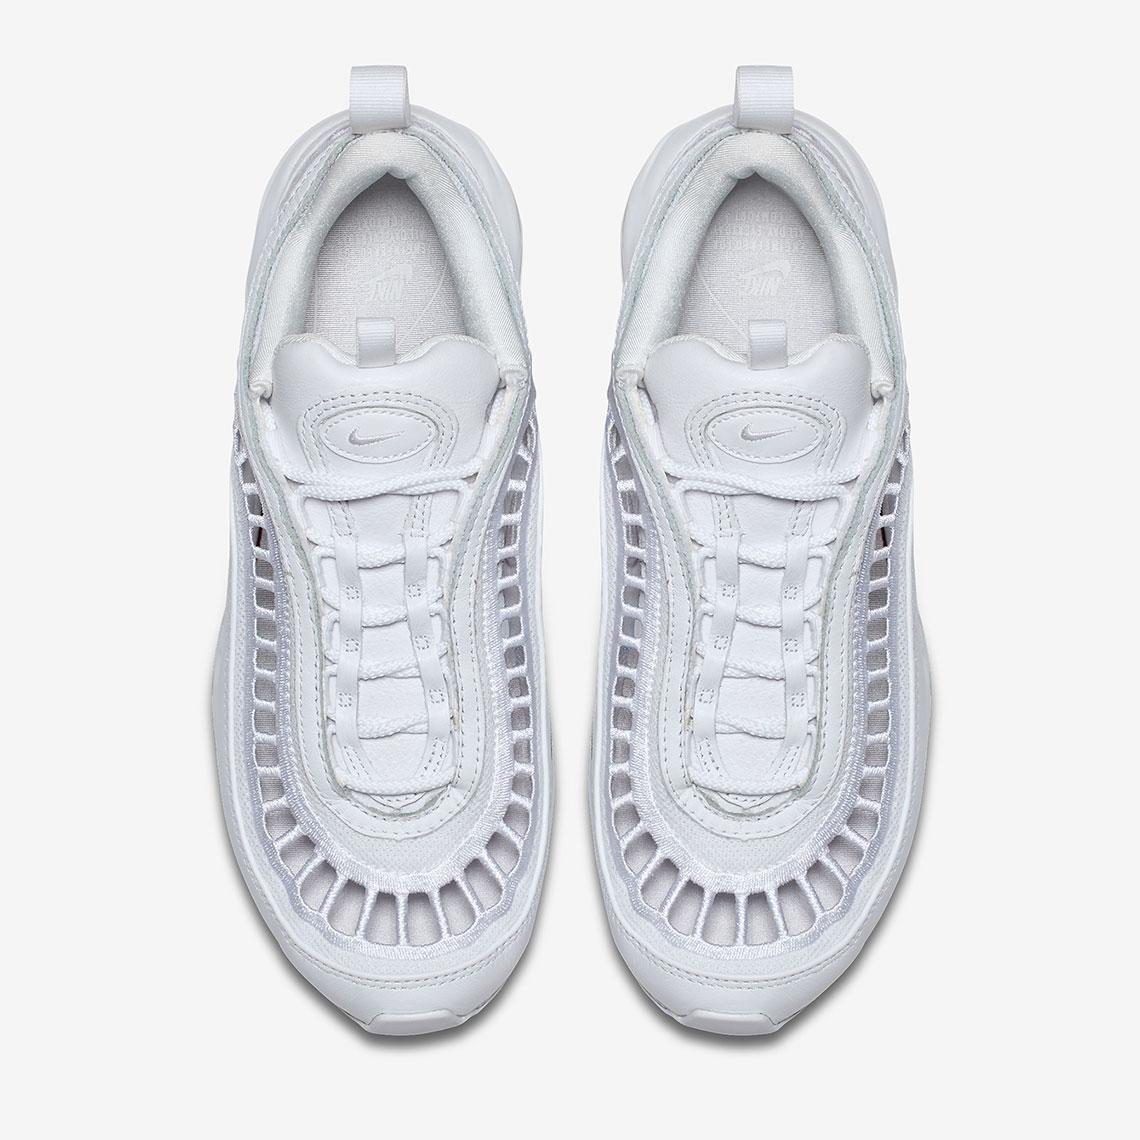 Nike Air Max 97 De Las Mujeres Conversan De Ultra Blanco XabUaCP9za